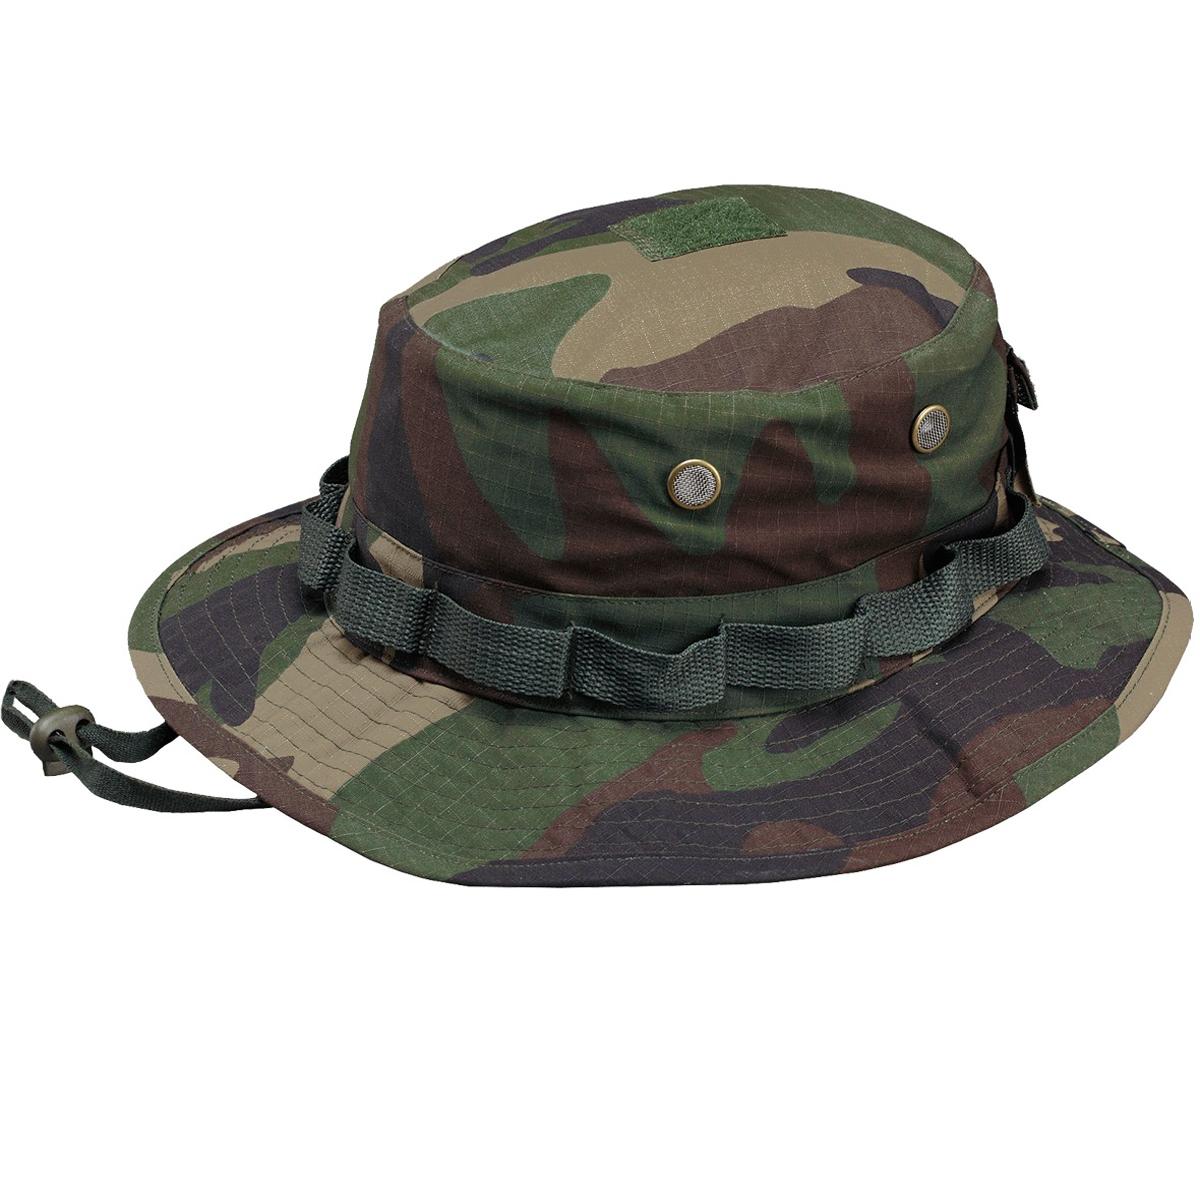 Details about Pentagon Jungle Hat Ripstop Commando Tactical Camo Protective  Headgear Woodland 13d2b54668d